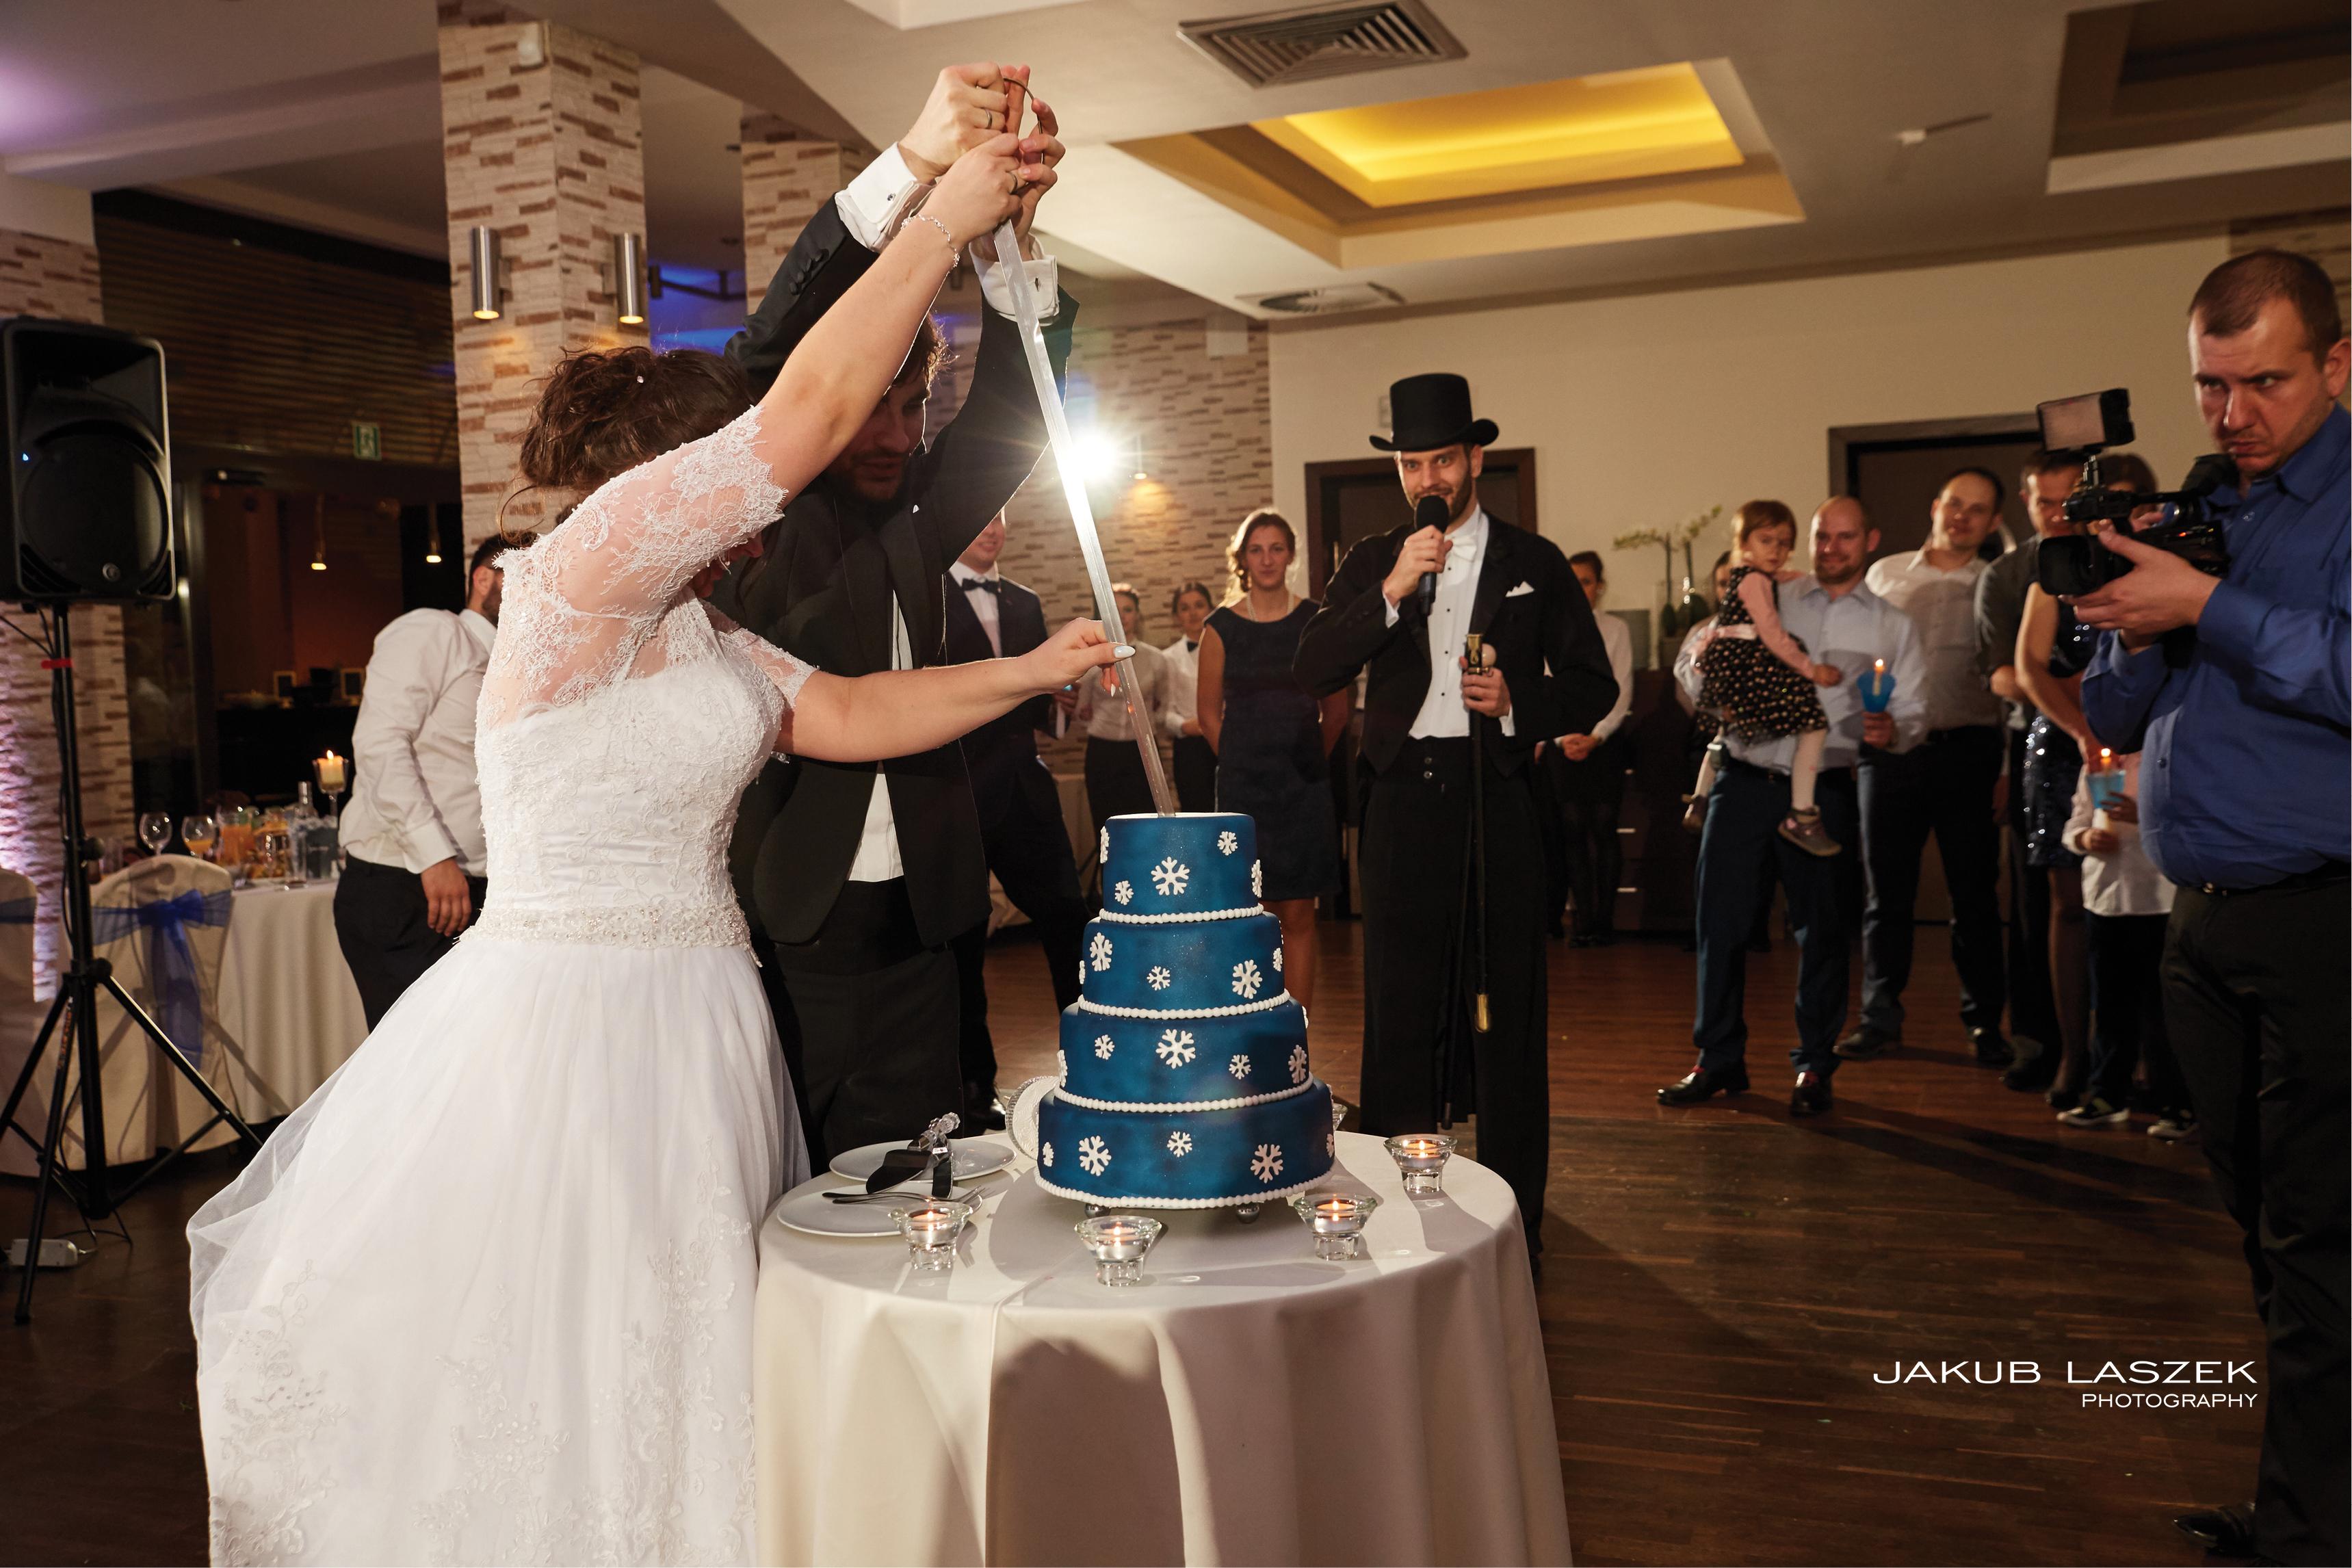 tarnow_fotograf_slubny_wedding_photographer45